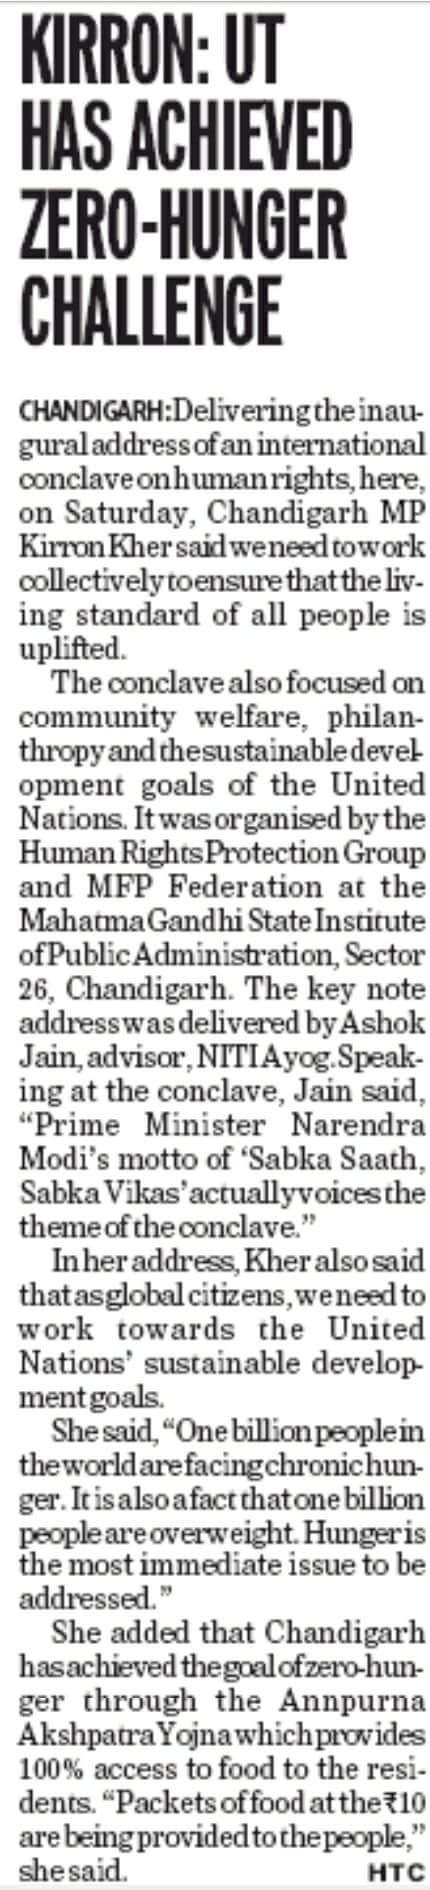 Hindustan Times - Nov 5, 2017